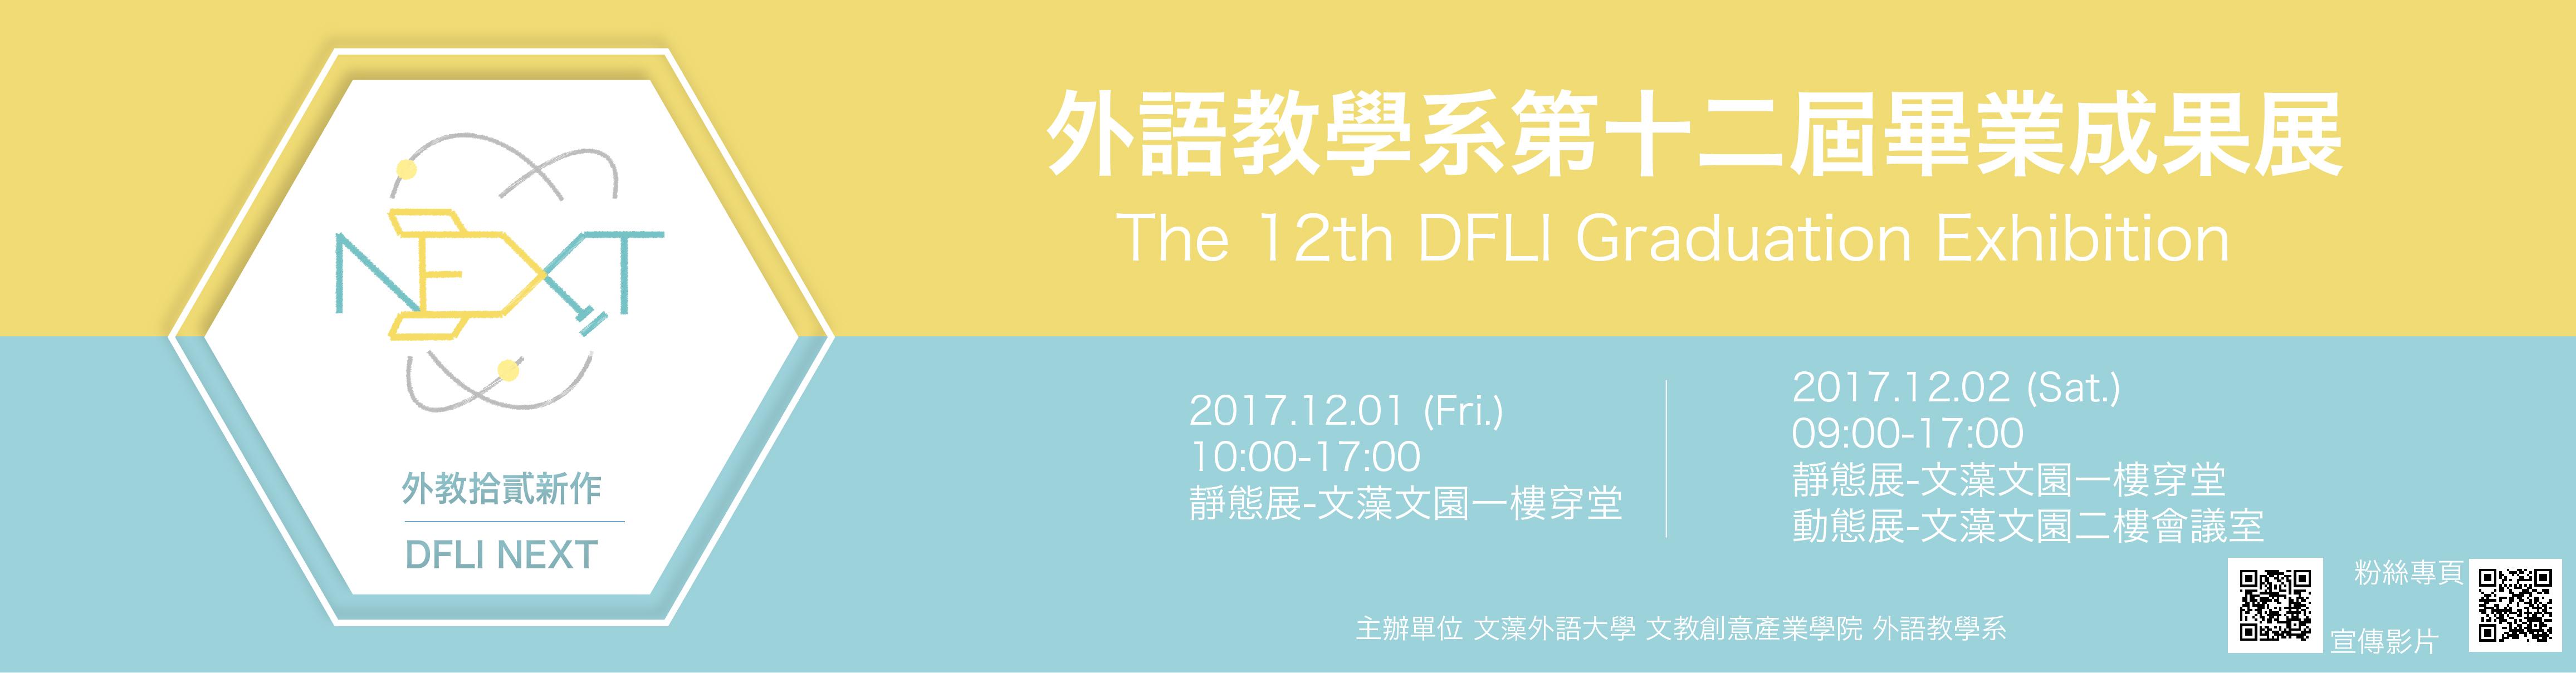 DFLI 12TH Graduation